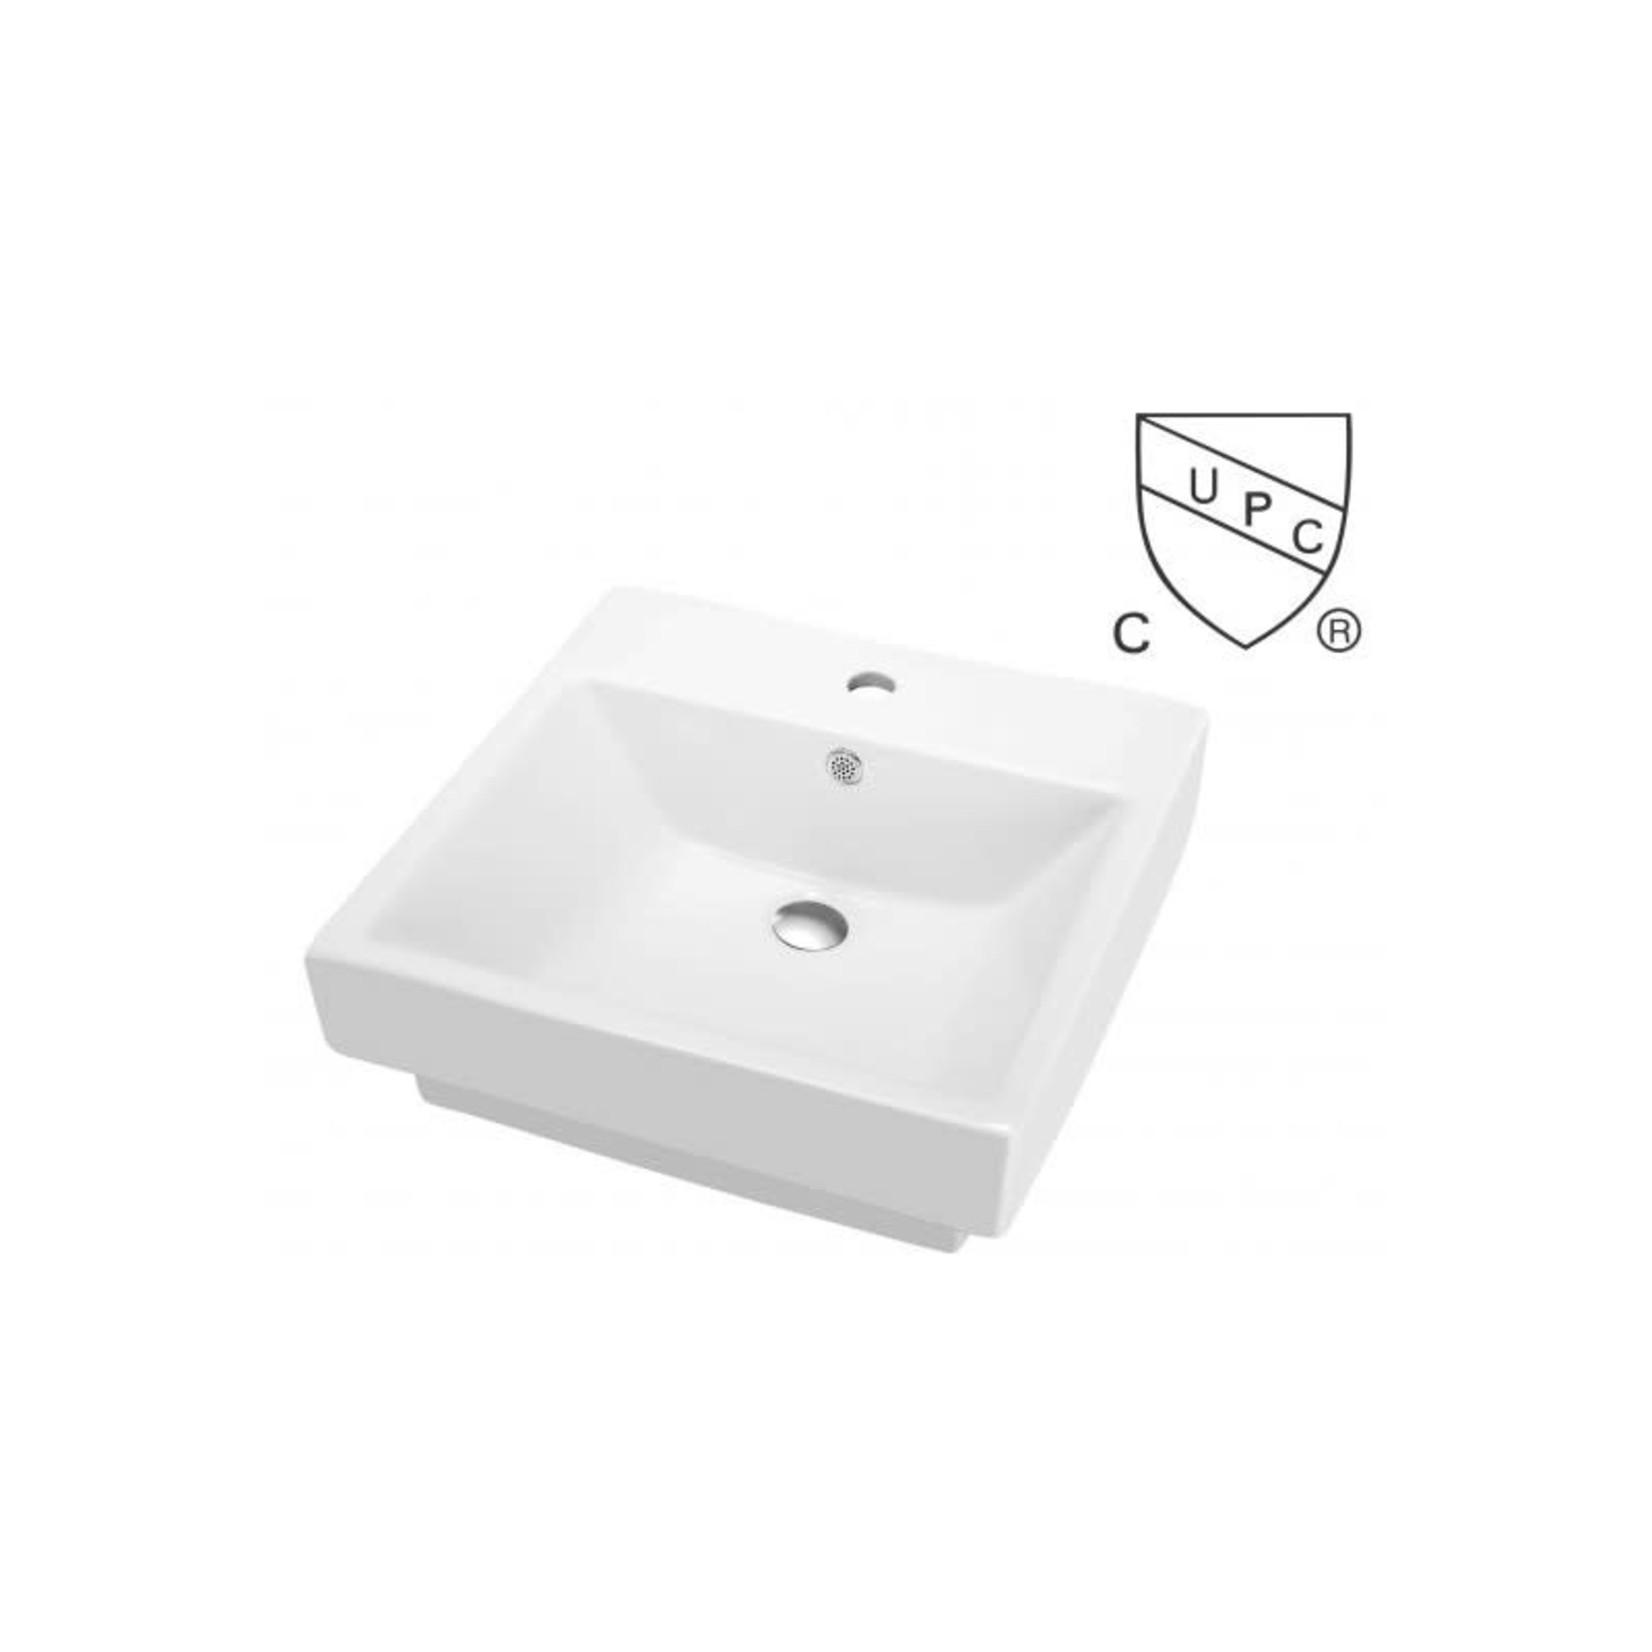 Porcelain washbasin S-300